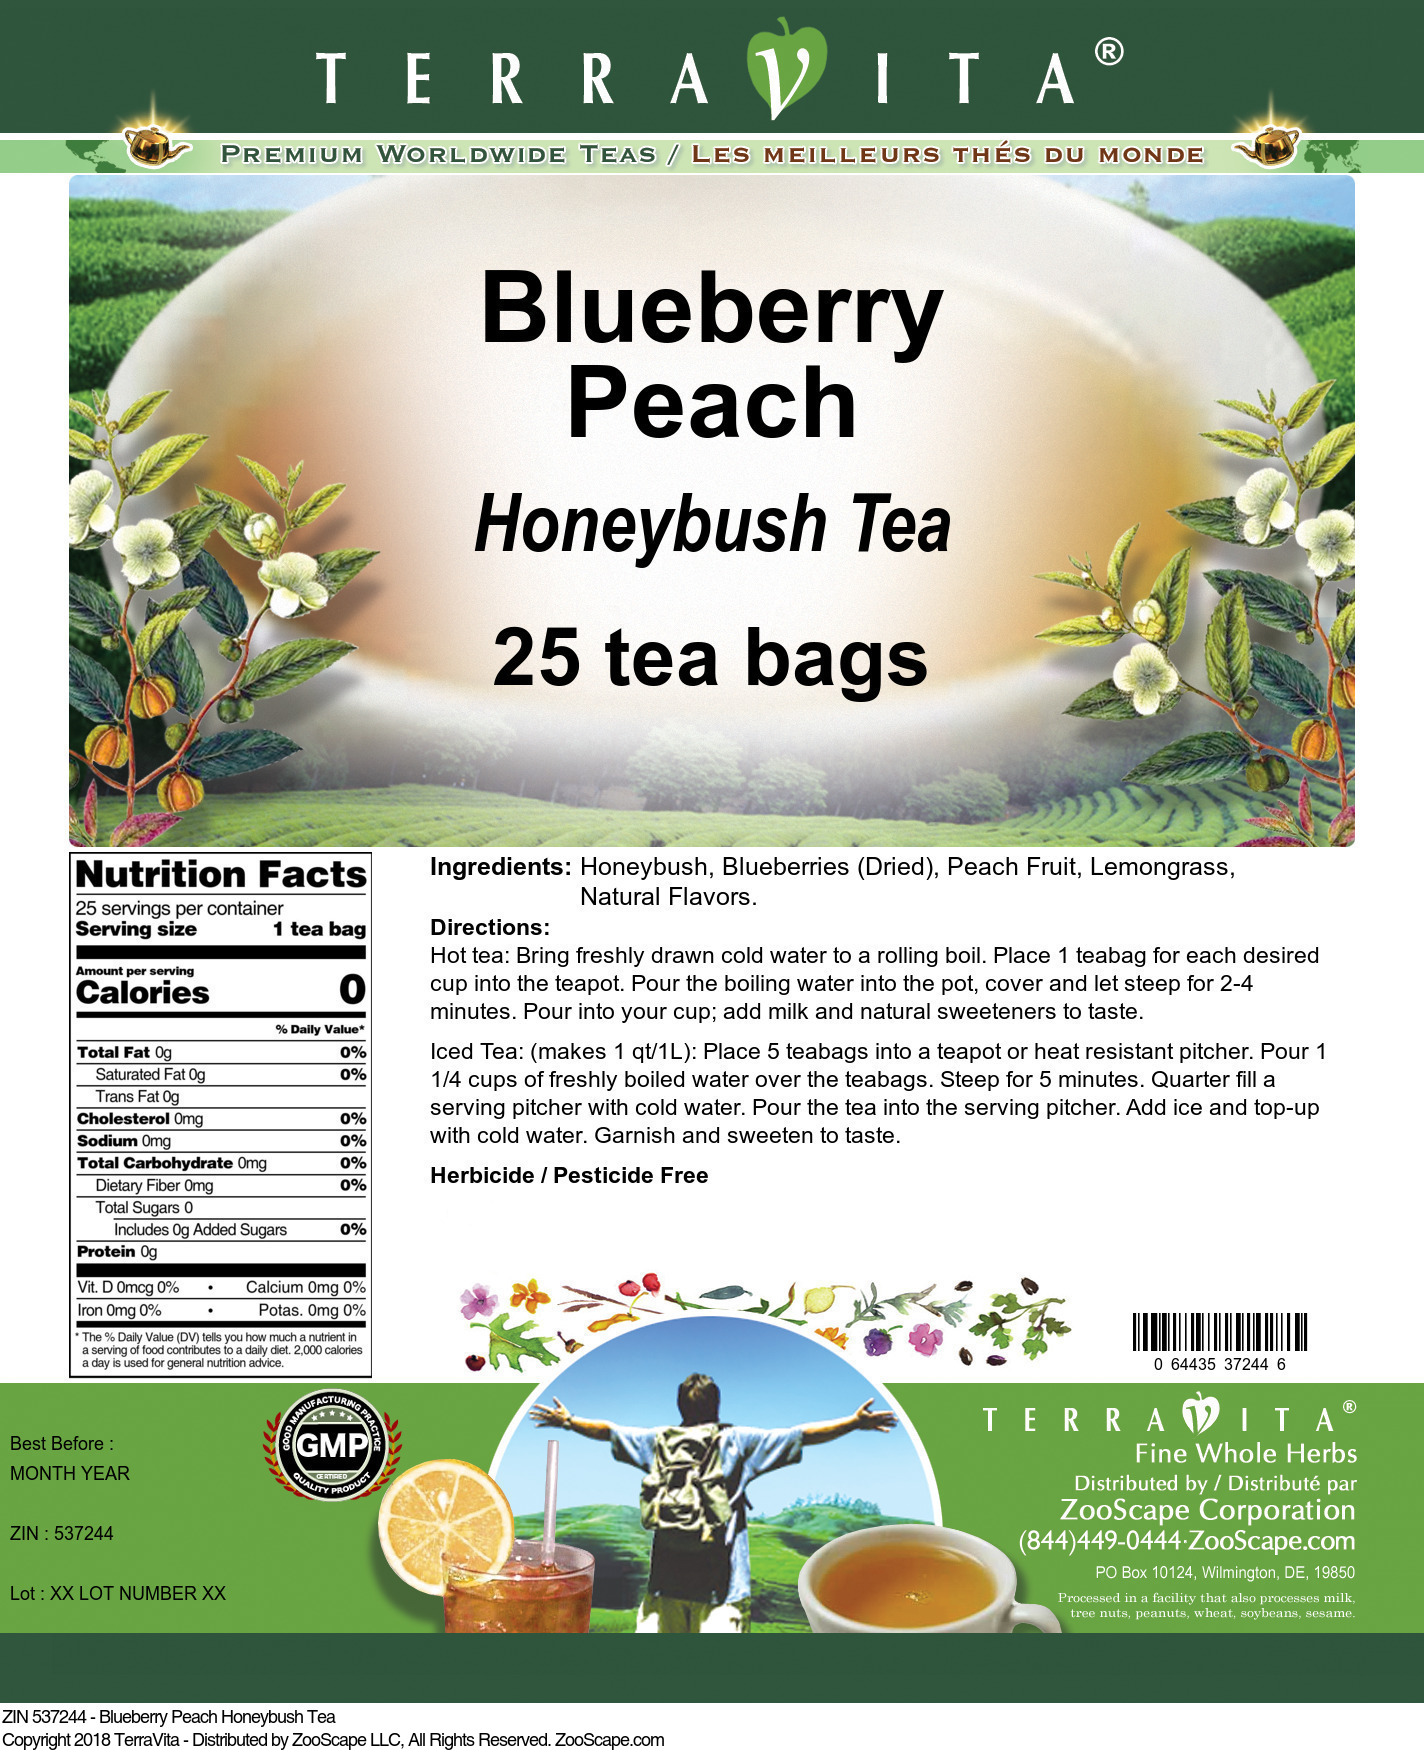 Blueberry Peach Honeybush Tea